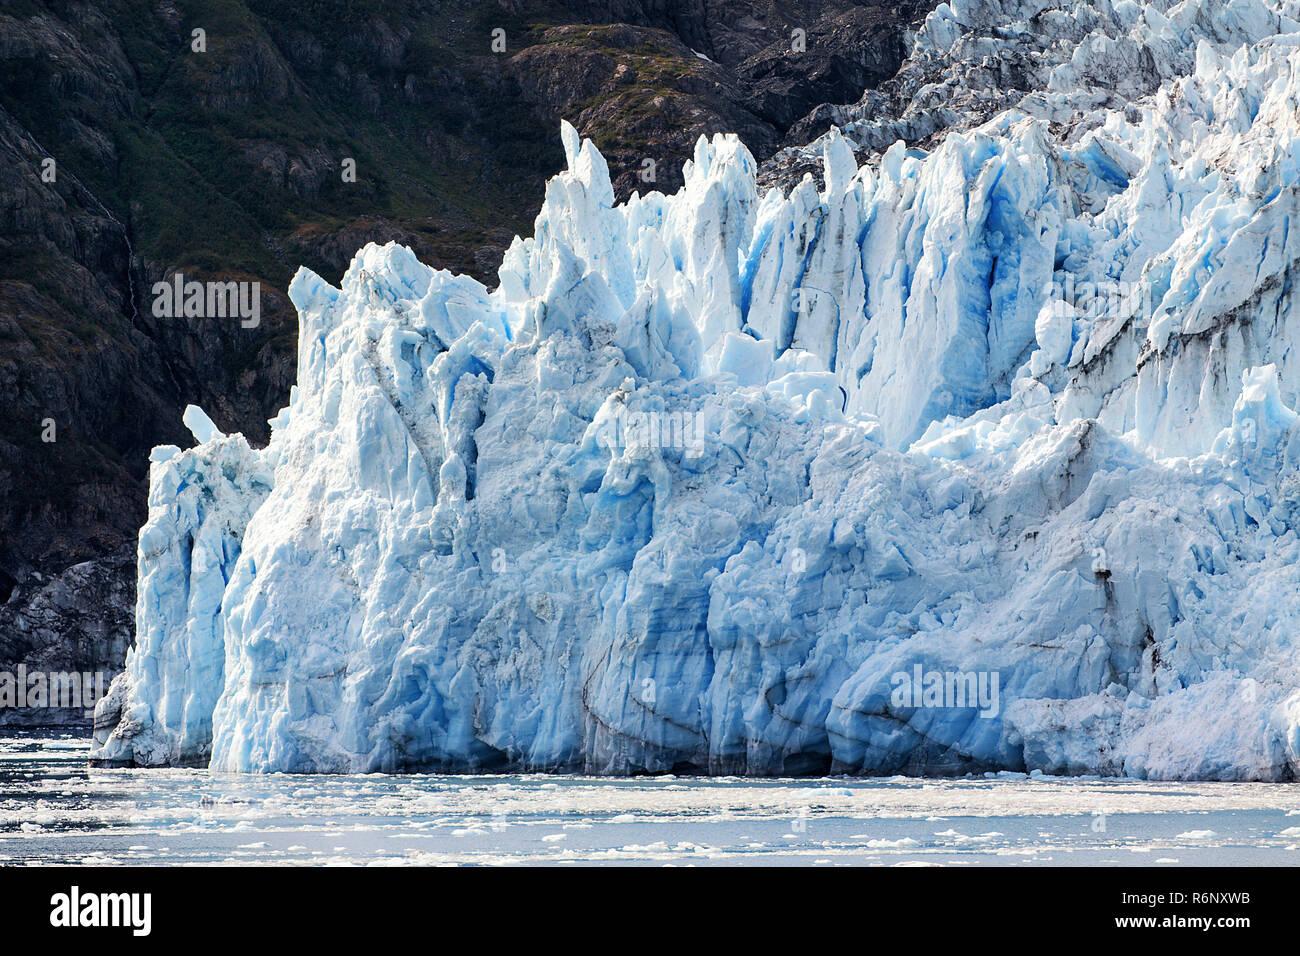 Alaska, USA: Überraschung Gletscher im Prince William Sound (close-up) Stockfoto